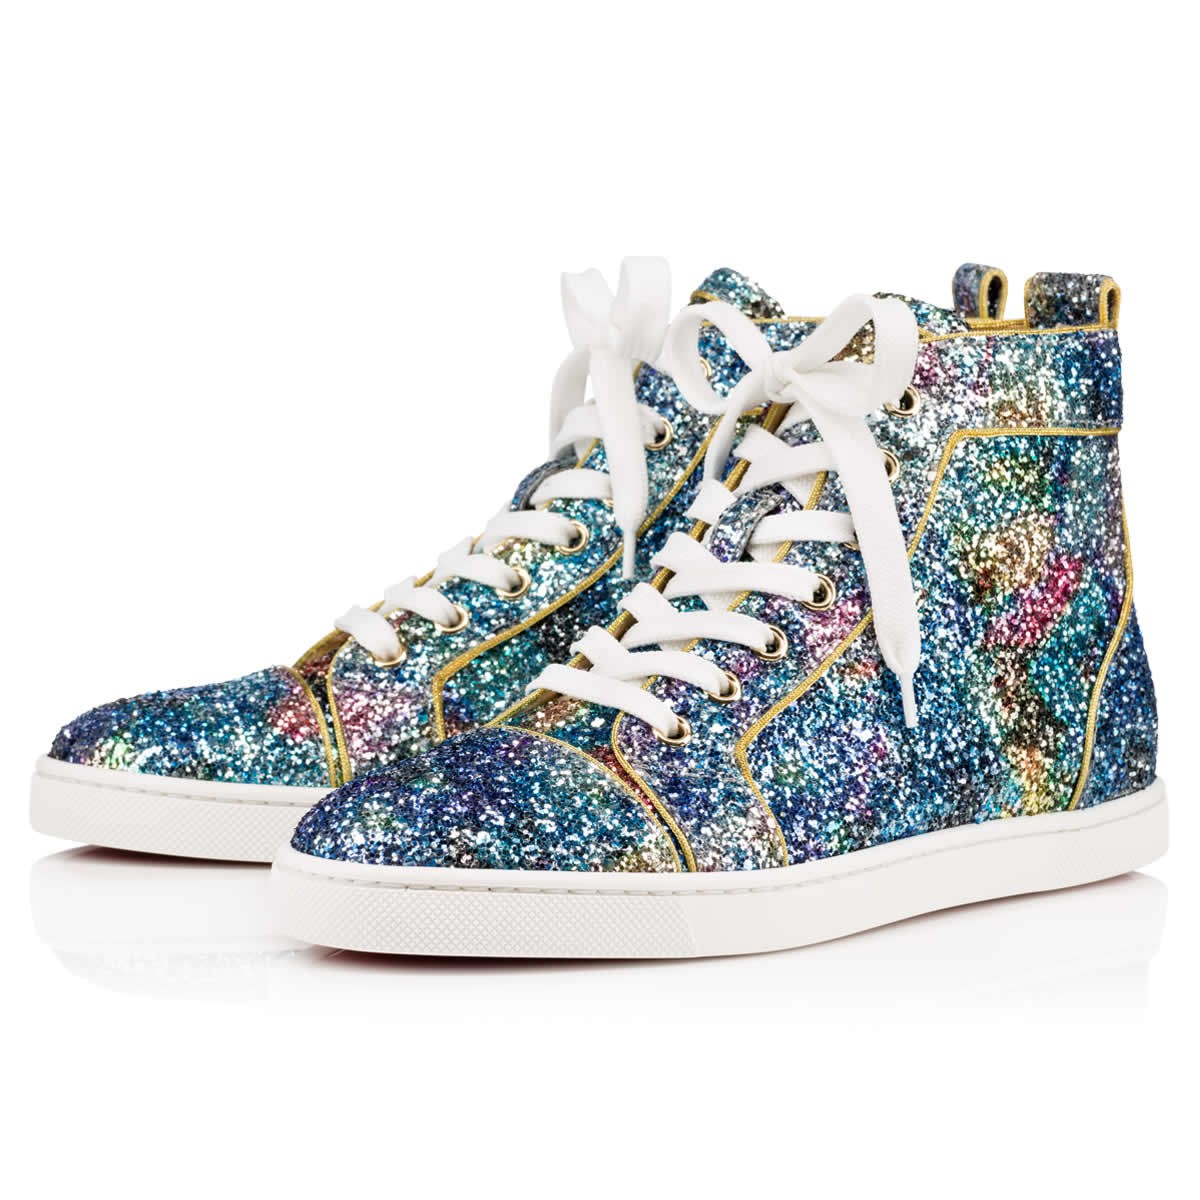 christian louboutin bip bip glitter high top sneakers